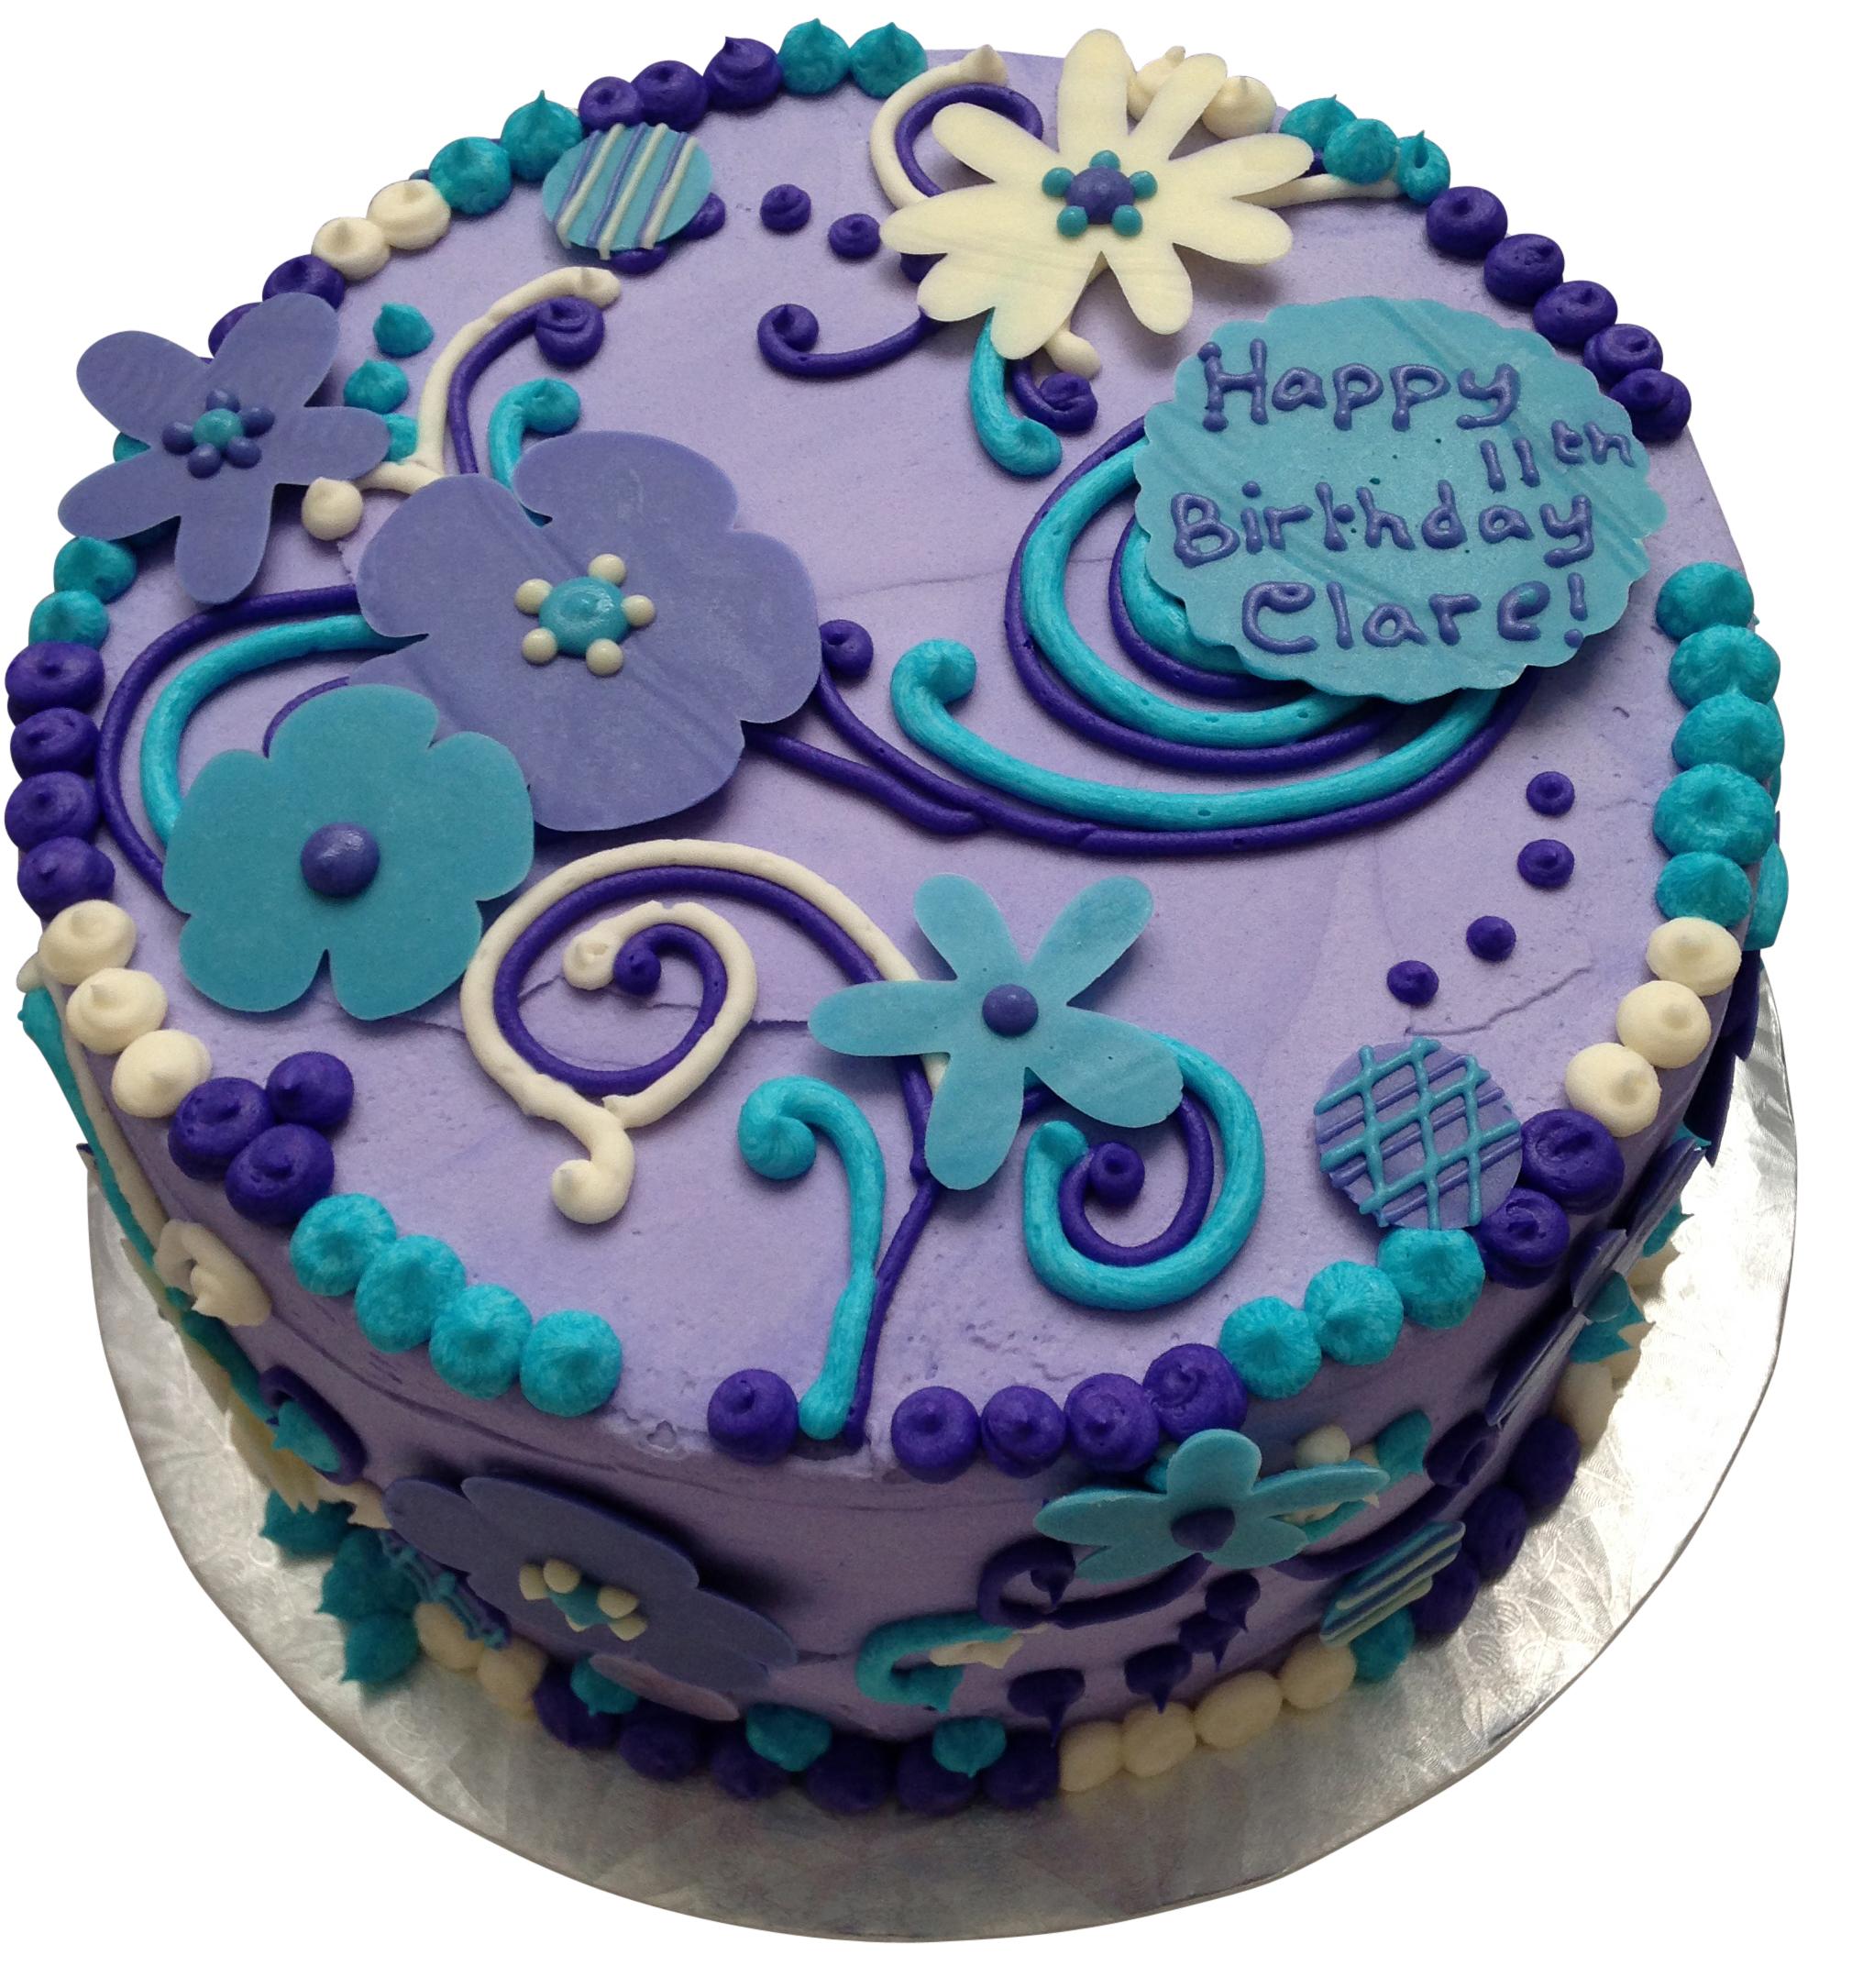 BeBe-Cakes-Swirls-All-Occasion-Cake.JPG